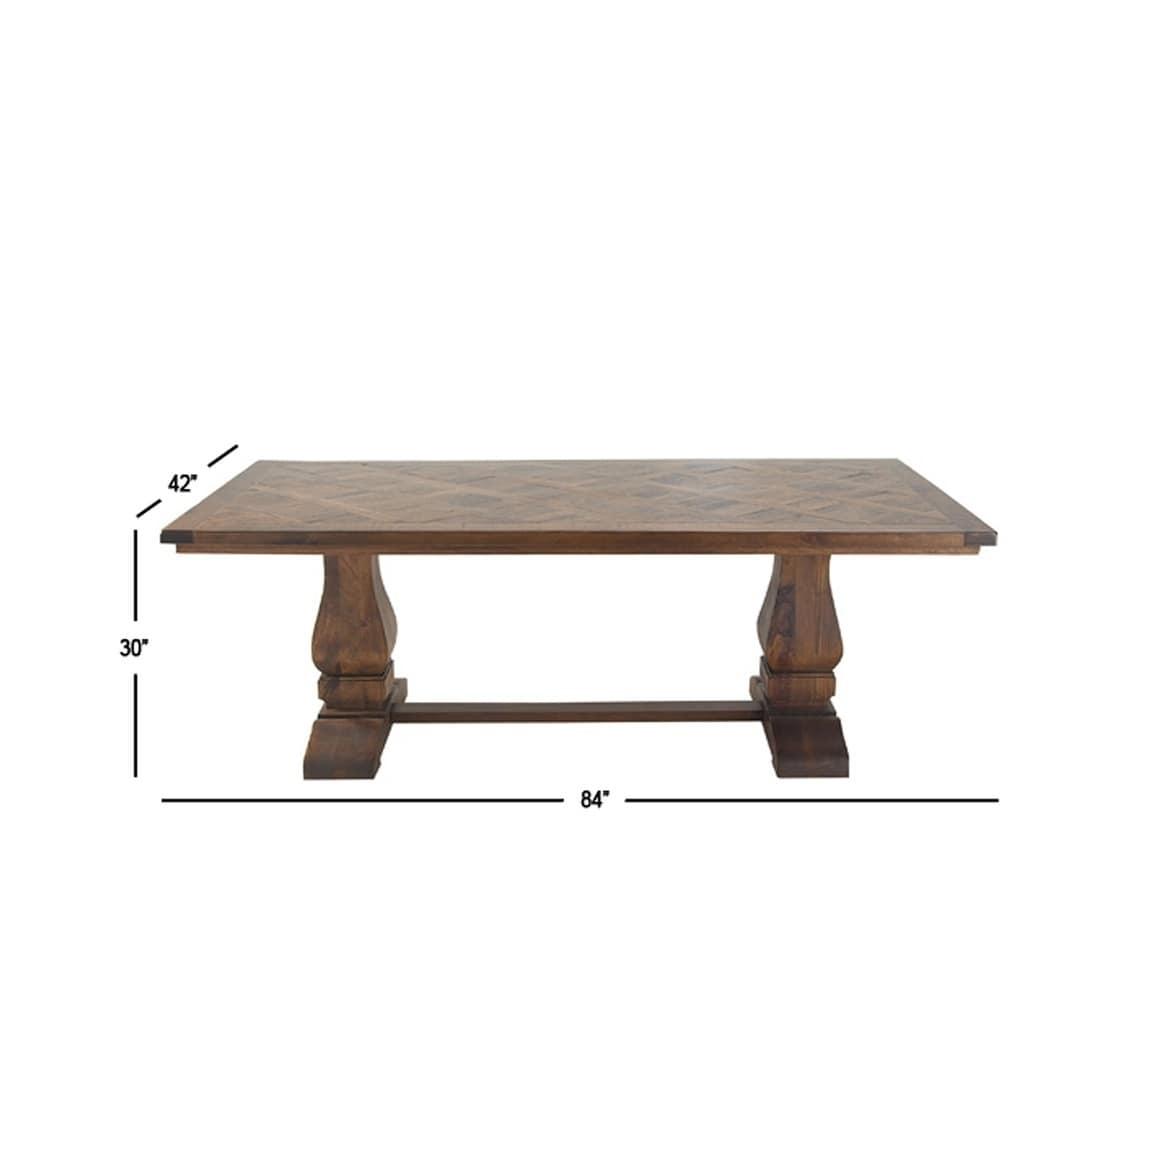 Awe Inspiring Studio 350 Mahogany Finished Mango Wood Traditional Dining Table Uwap Interior Chair Design Uwaporg